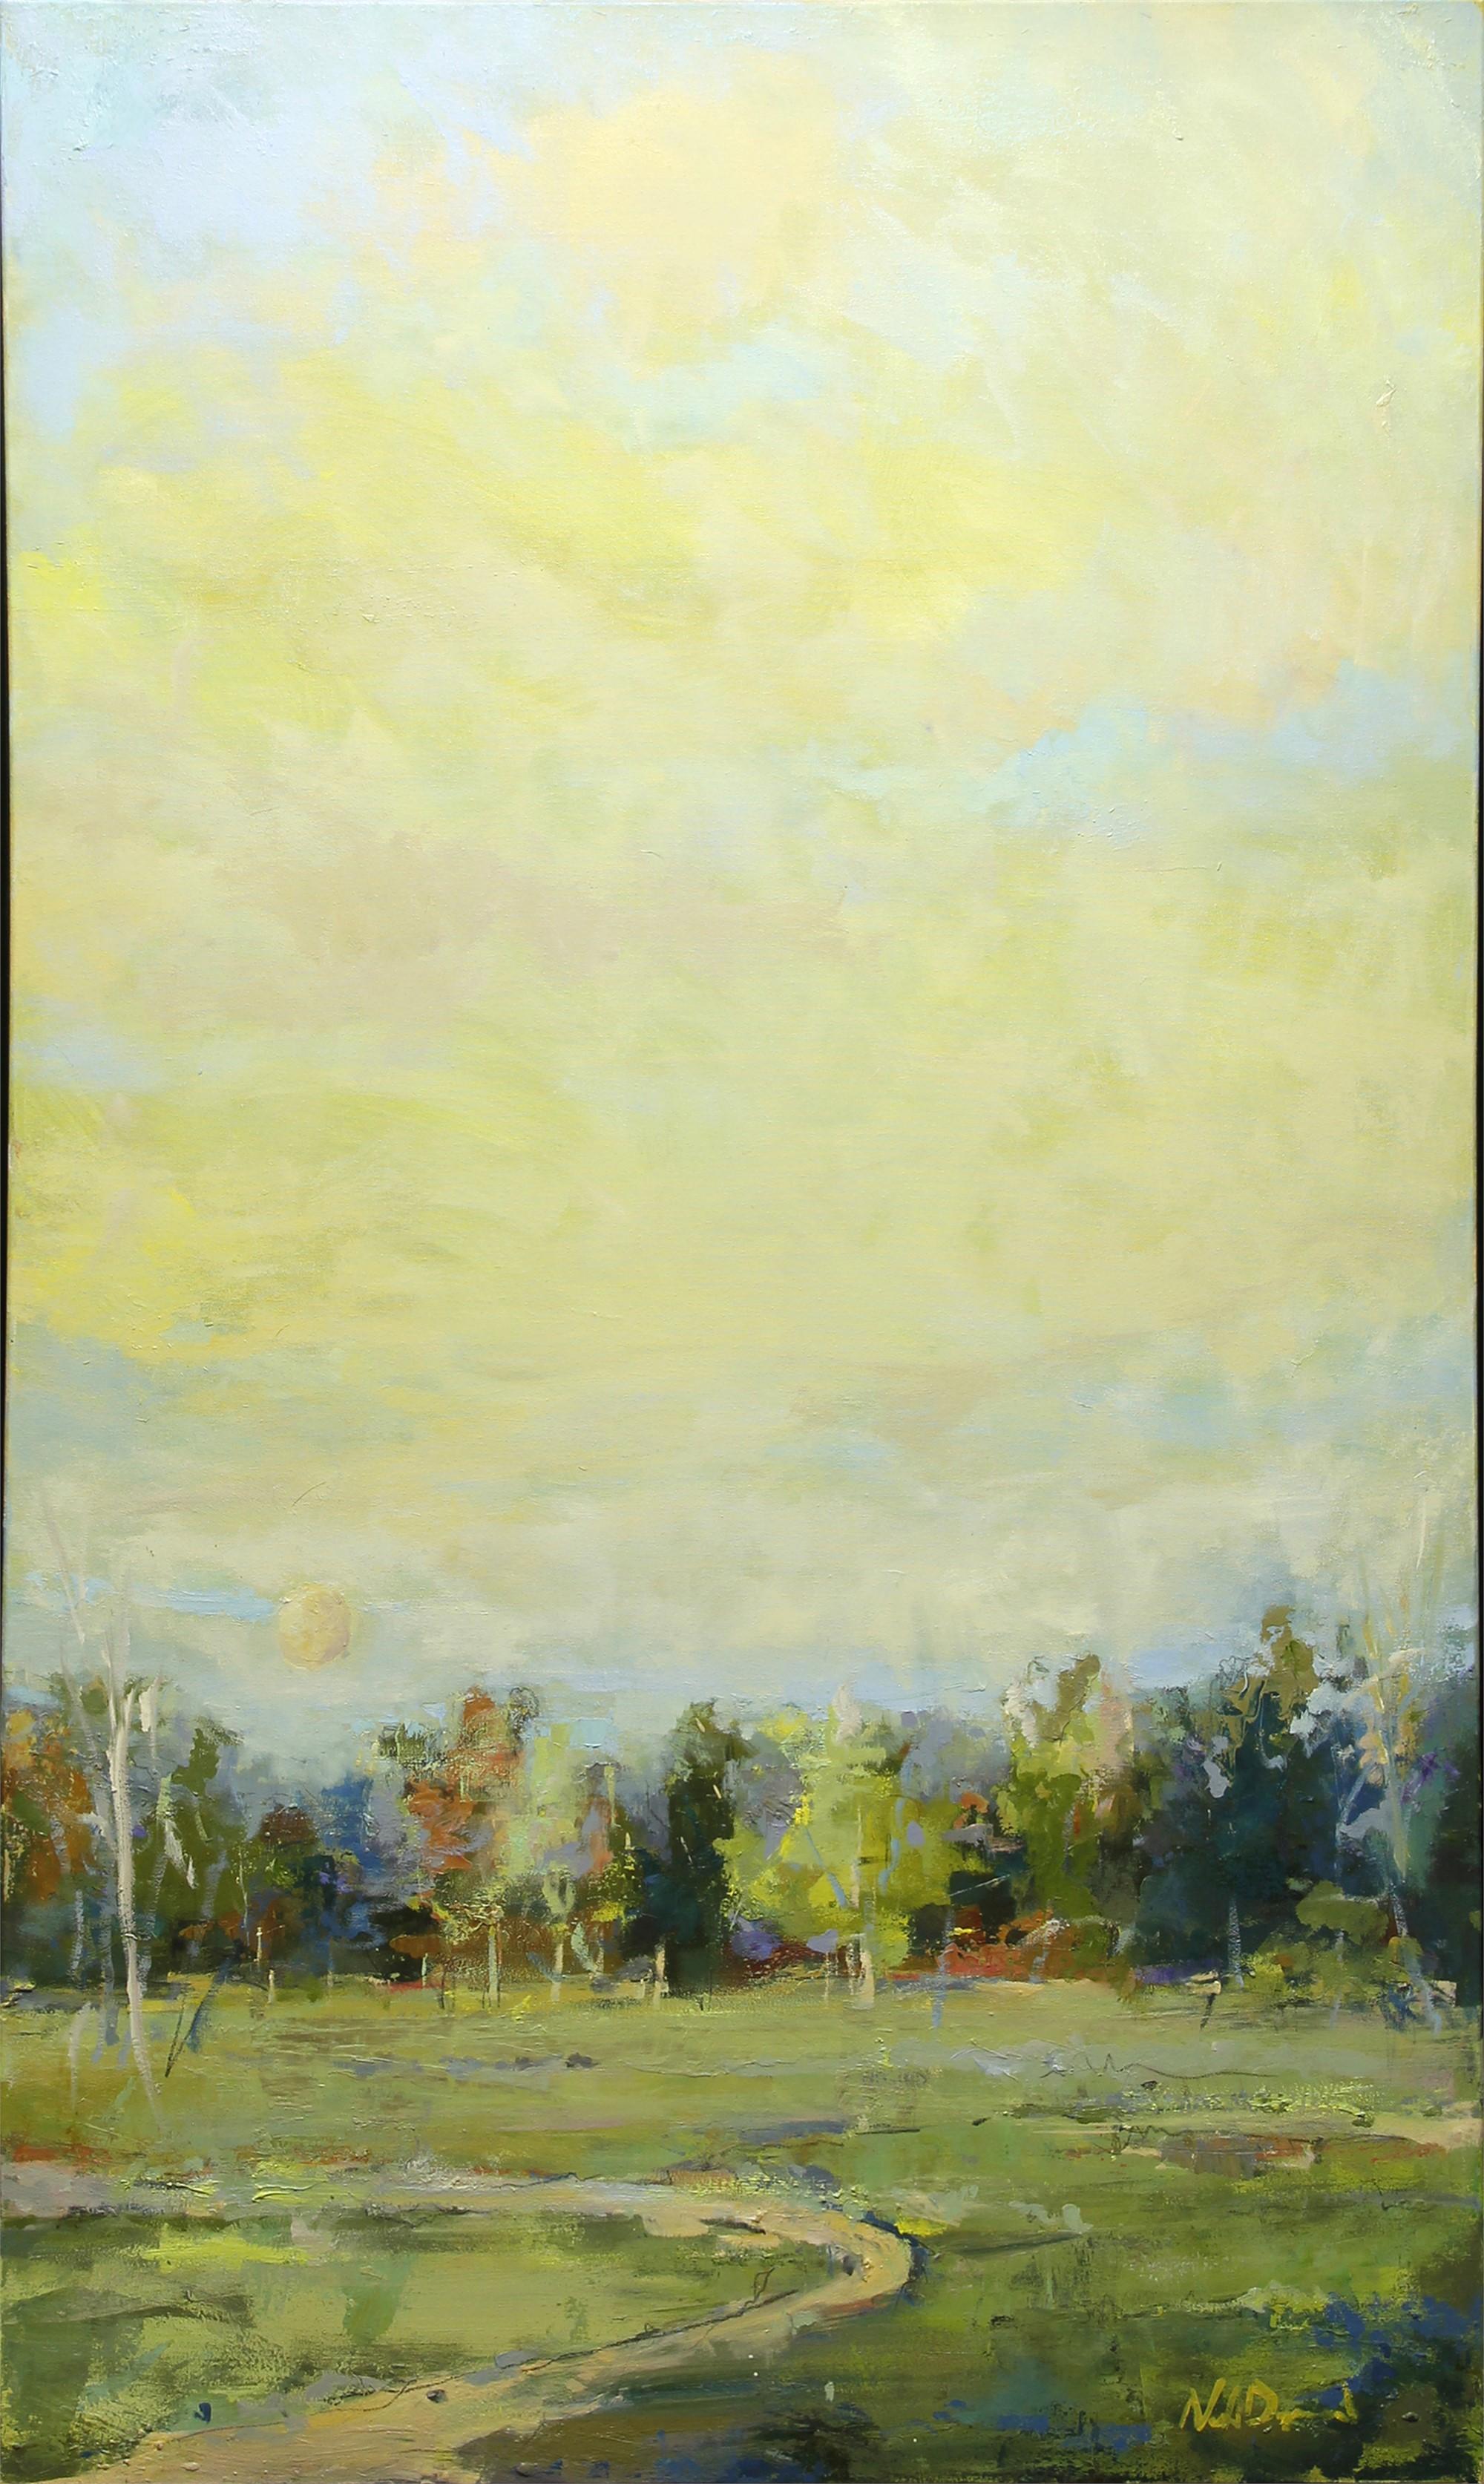 Beyond the Sun by Noah Desmond